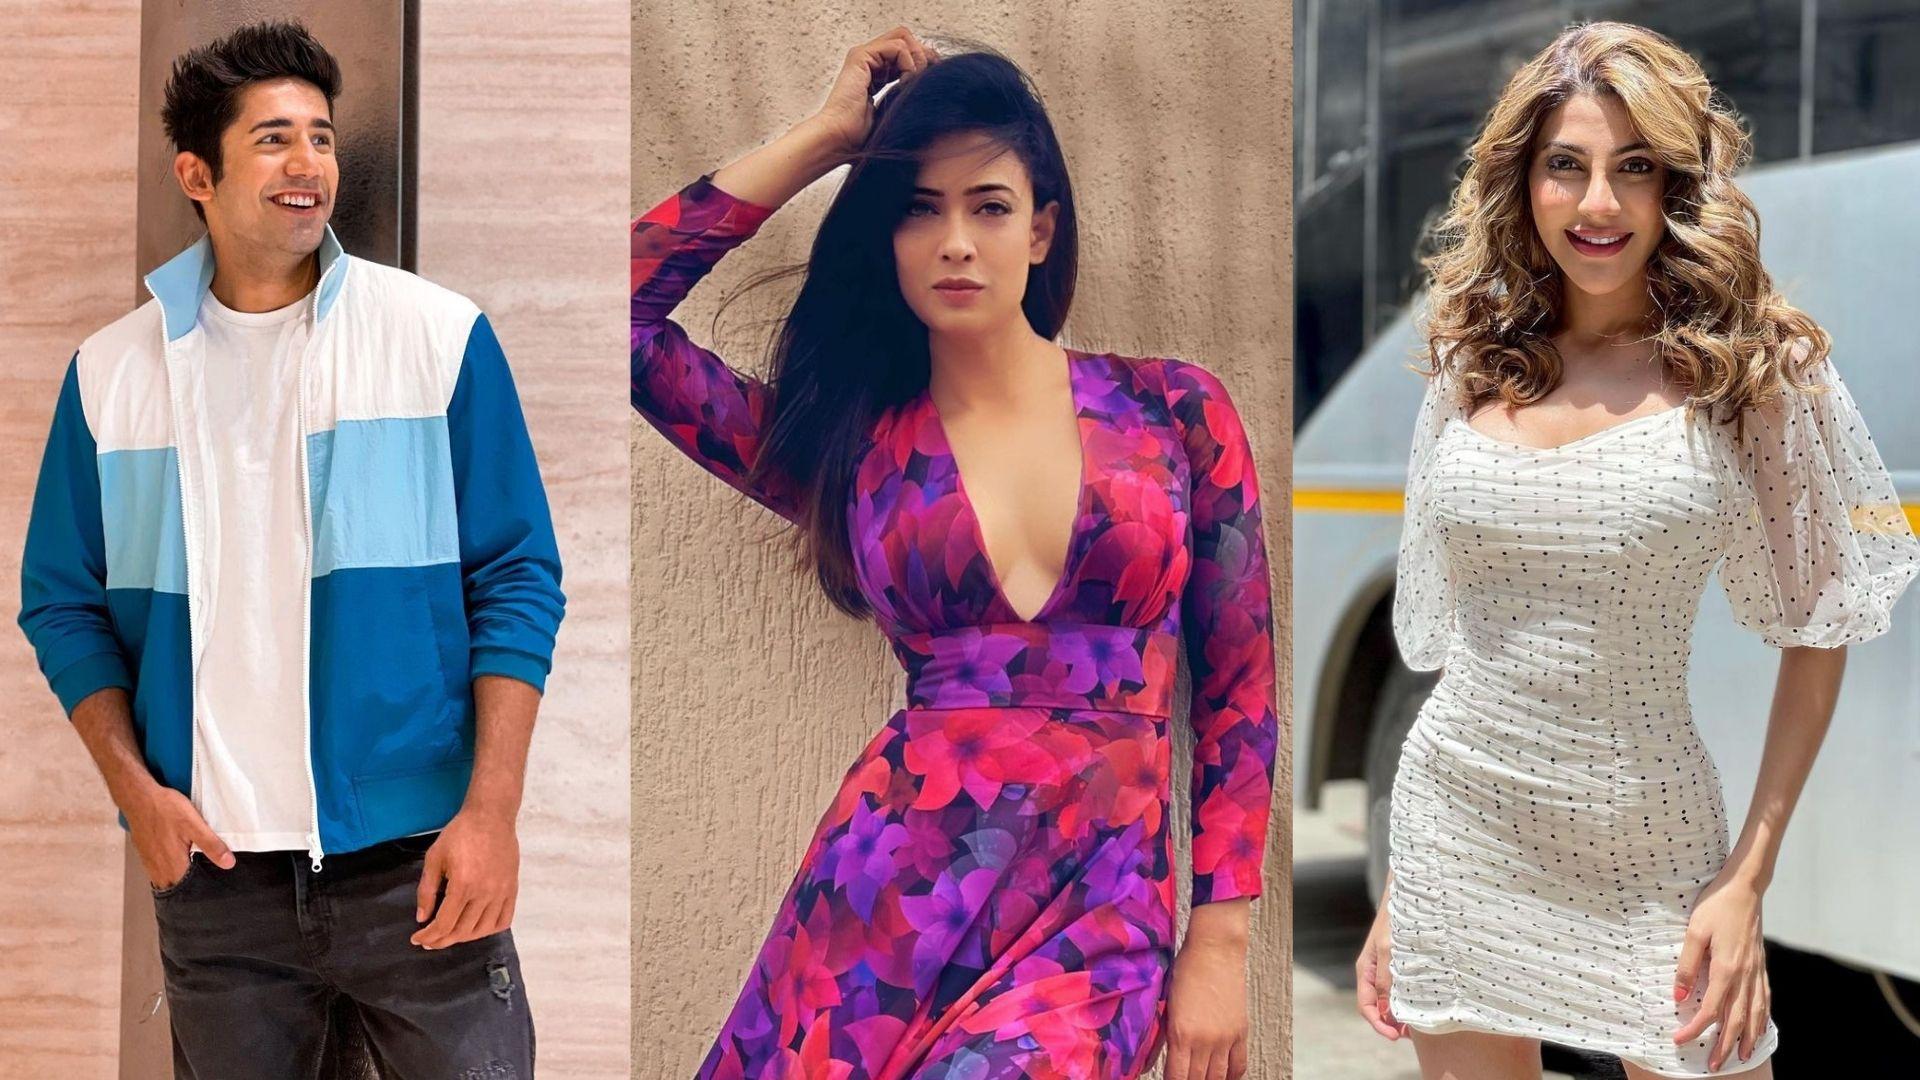 Kkk 11: Varun Sood, Shweta Tiwari, Nikki Tamboli And Others Dance The Night Away To Celebrate Arjun Bijlani's Victory – Inside Photos And Videos